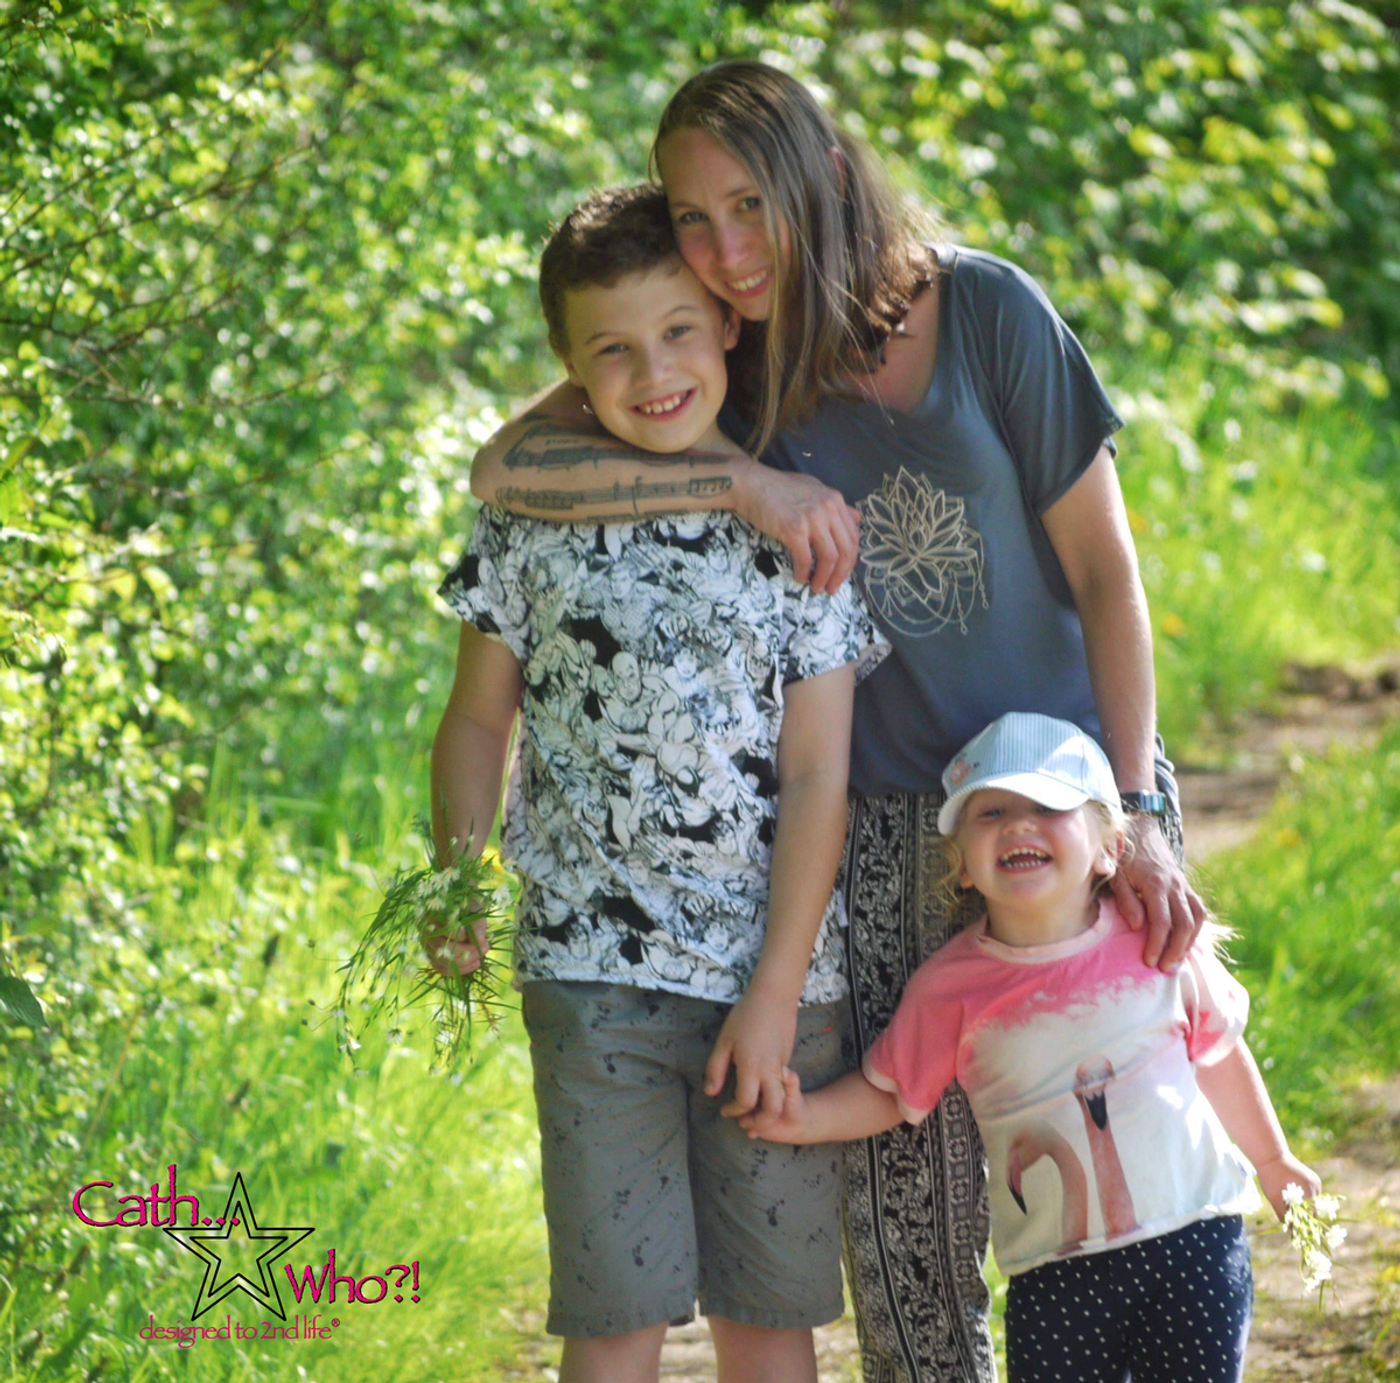 Produktfoto 3 von MiToSa-Kreativ für Schnittmuster Kombi E-Book Family Shirt Kinder, Damen & Männer Gr. 74 - 164, 34 - 52 & XS - 3XL